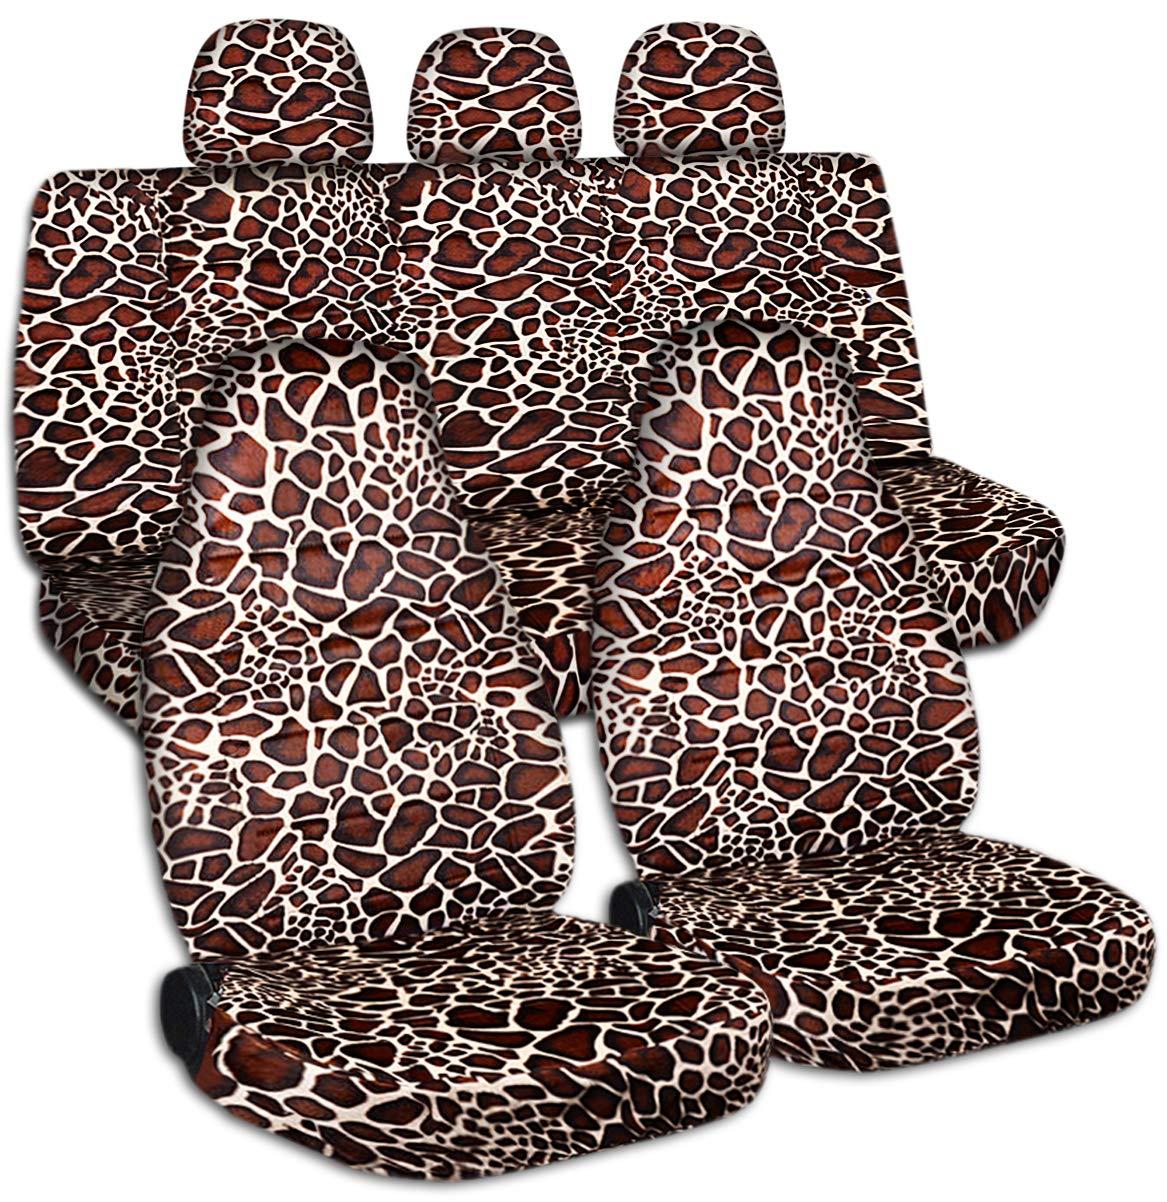 Animal Print Car Seat Covers w 3 Rear Headrest Covers: Giraffe - Semi-Custom Fit - Full Set - Will Make Fit Any Car/Truck/Van/SUV (30 Prints)